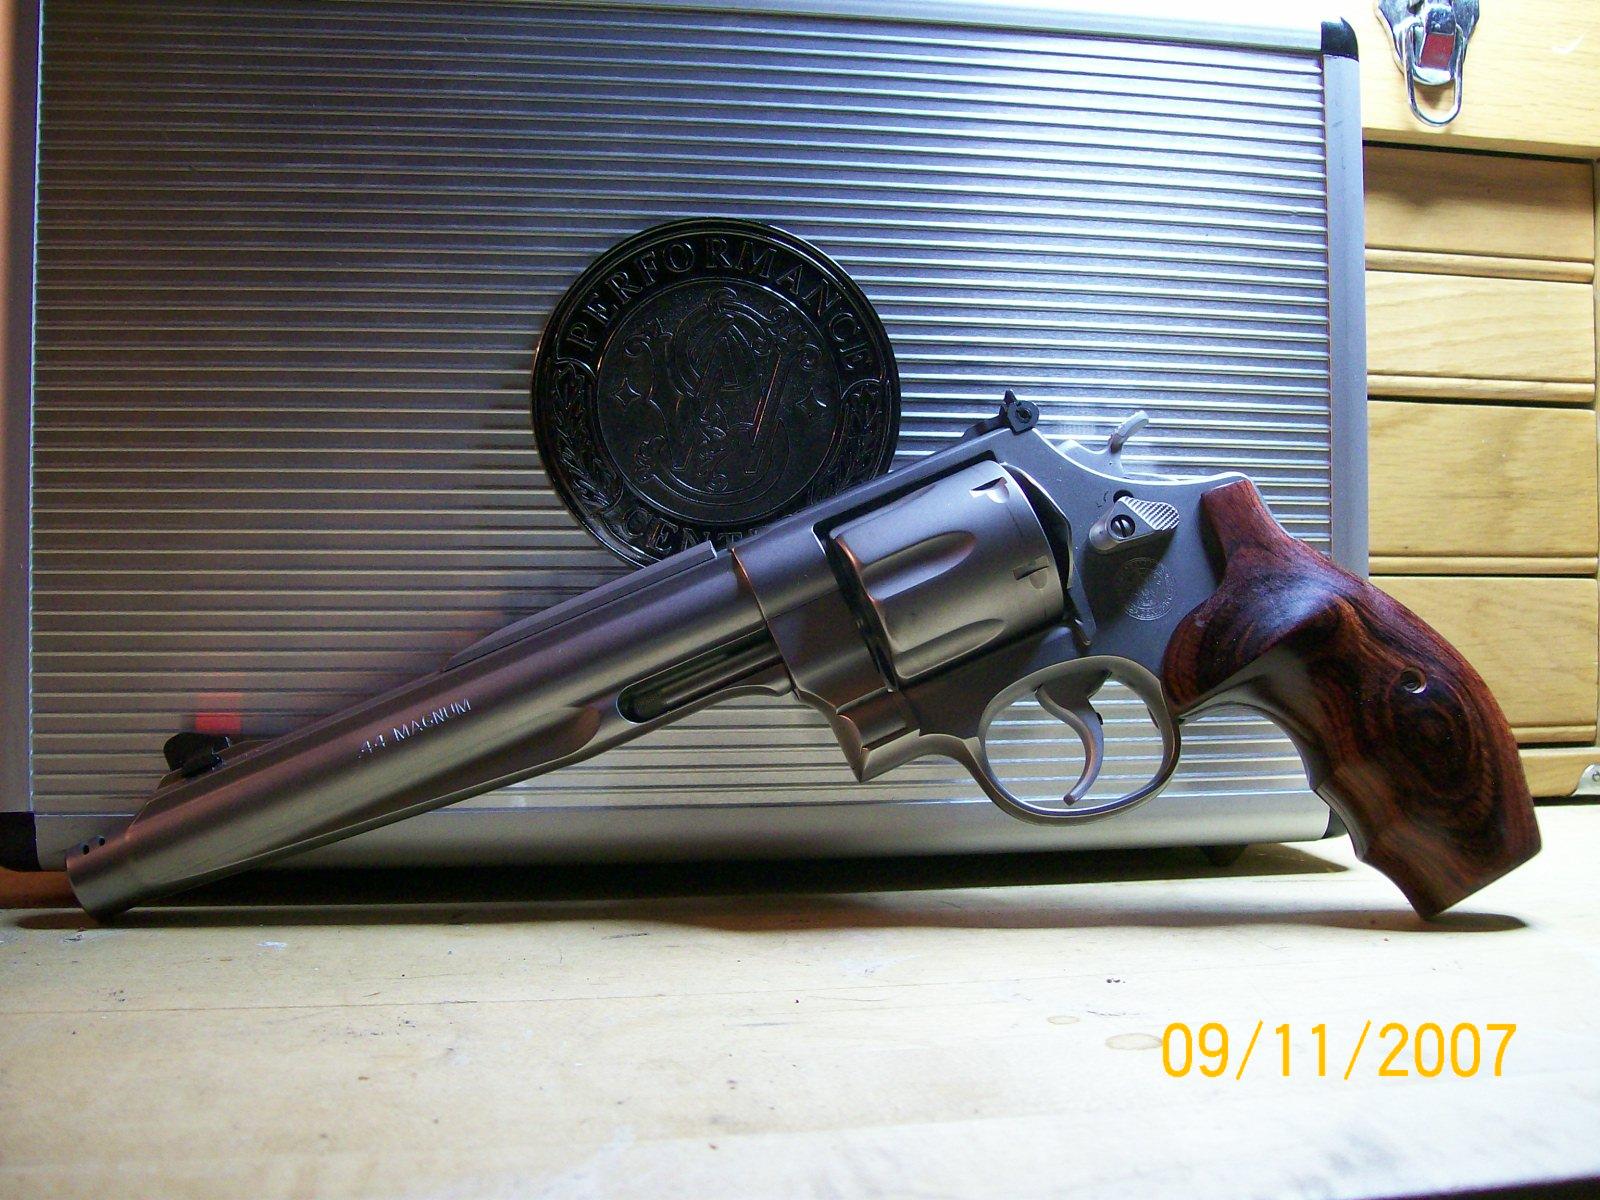 S&W Model 629 Compensated Hunter .44 Mag-000_0009.jpg